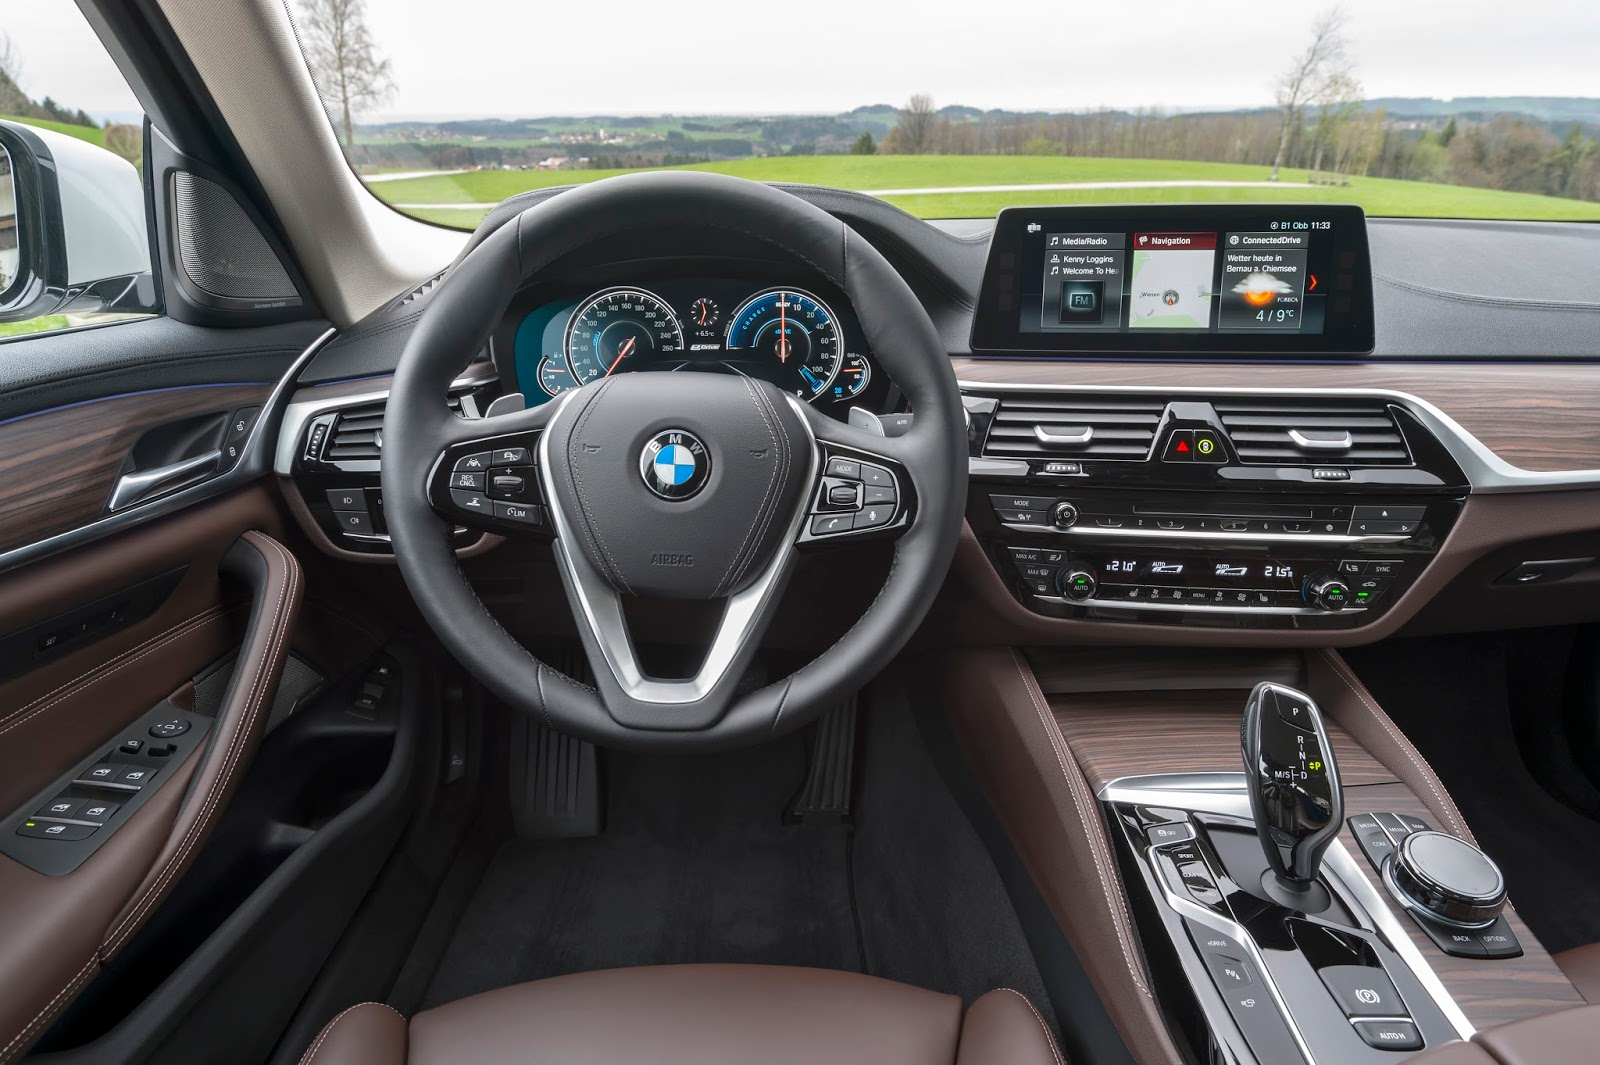 P90256378 highRes the new bmw 530e ipe Η BMW 530e iPerformance φέρνει την ηλεκτρική επανάσταση BMW, BMW 5, BMW 530e iPerformance, Electric cars, Hybrid, Λανσάρισμα